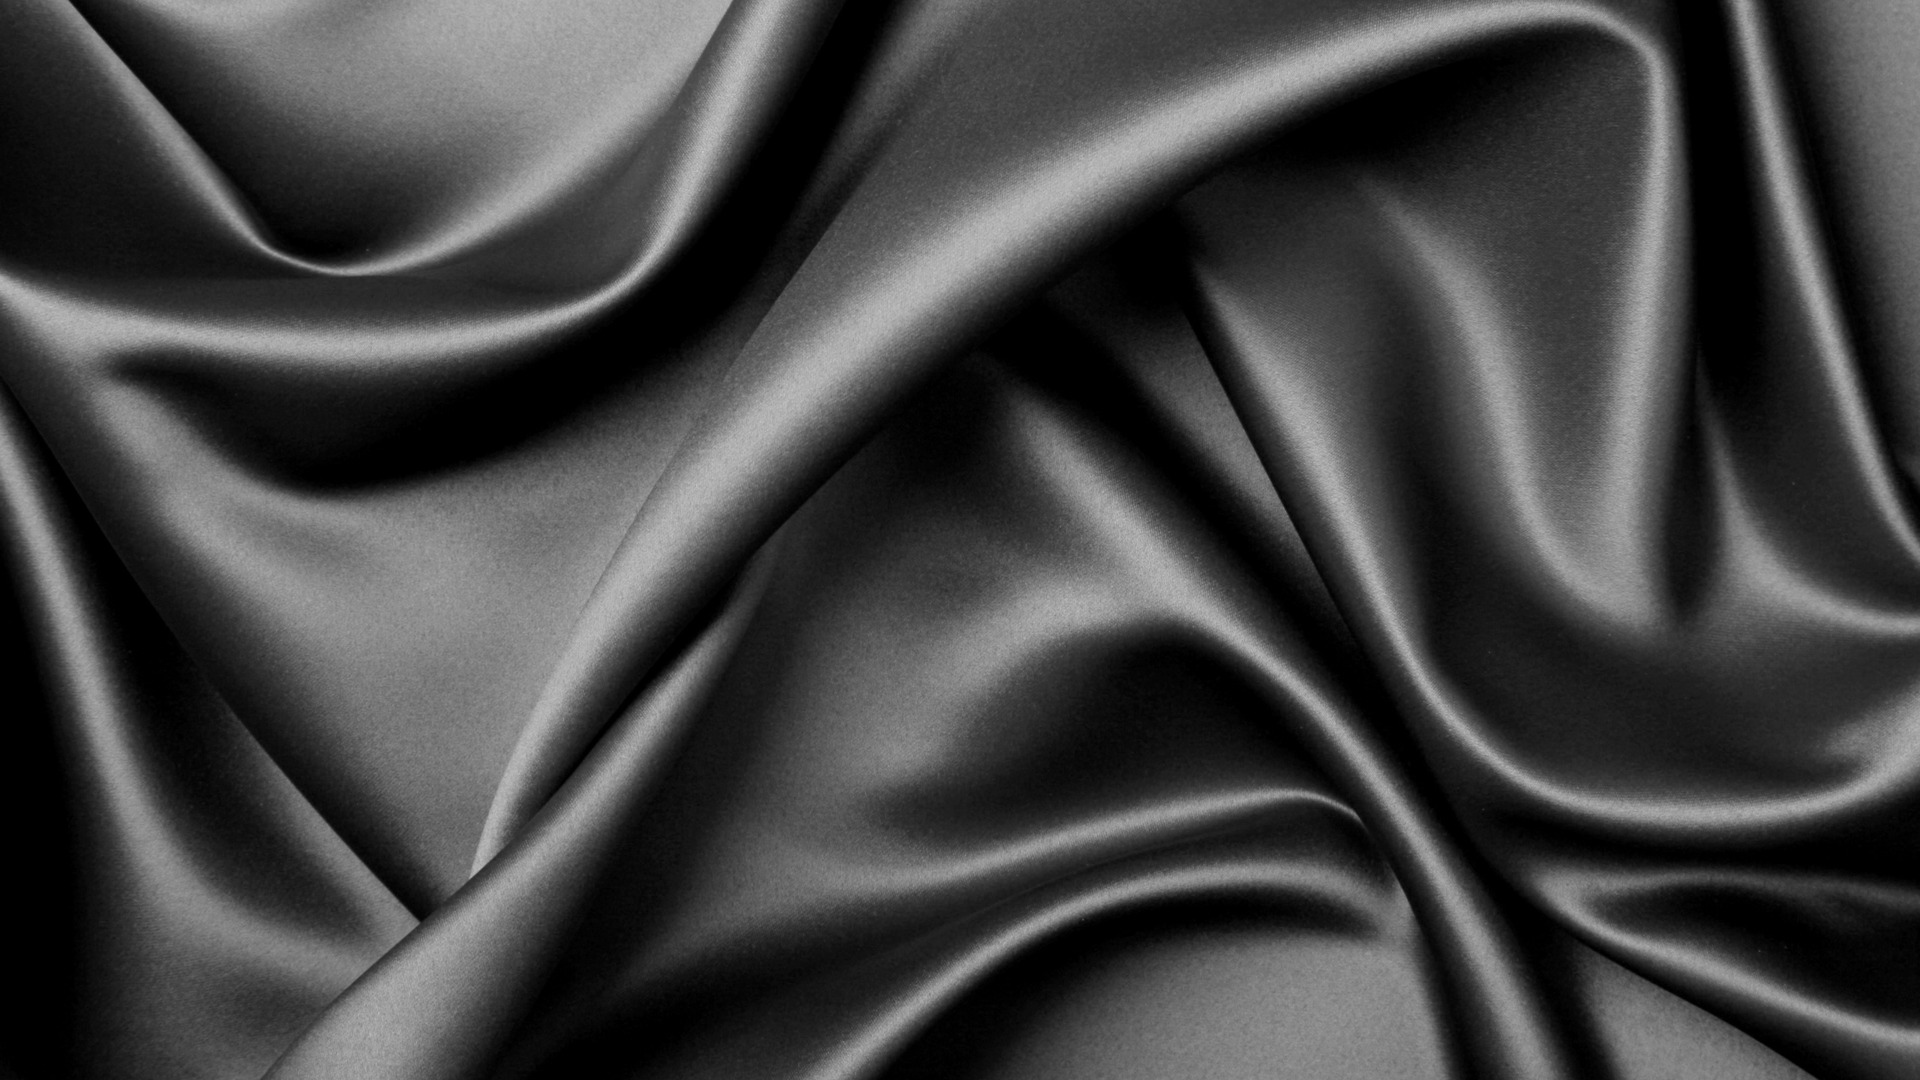 Black Linen Wallpaper - WallpaperSafari